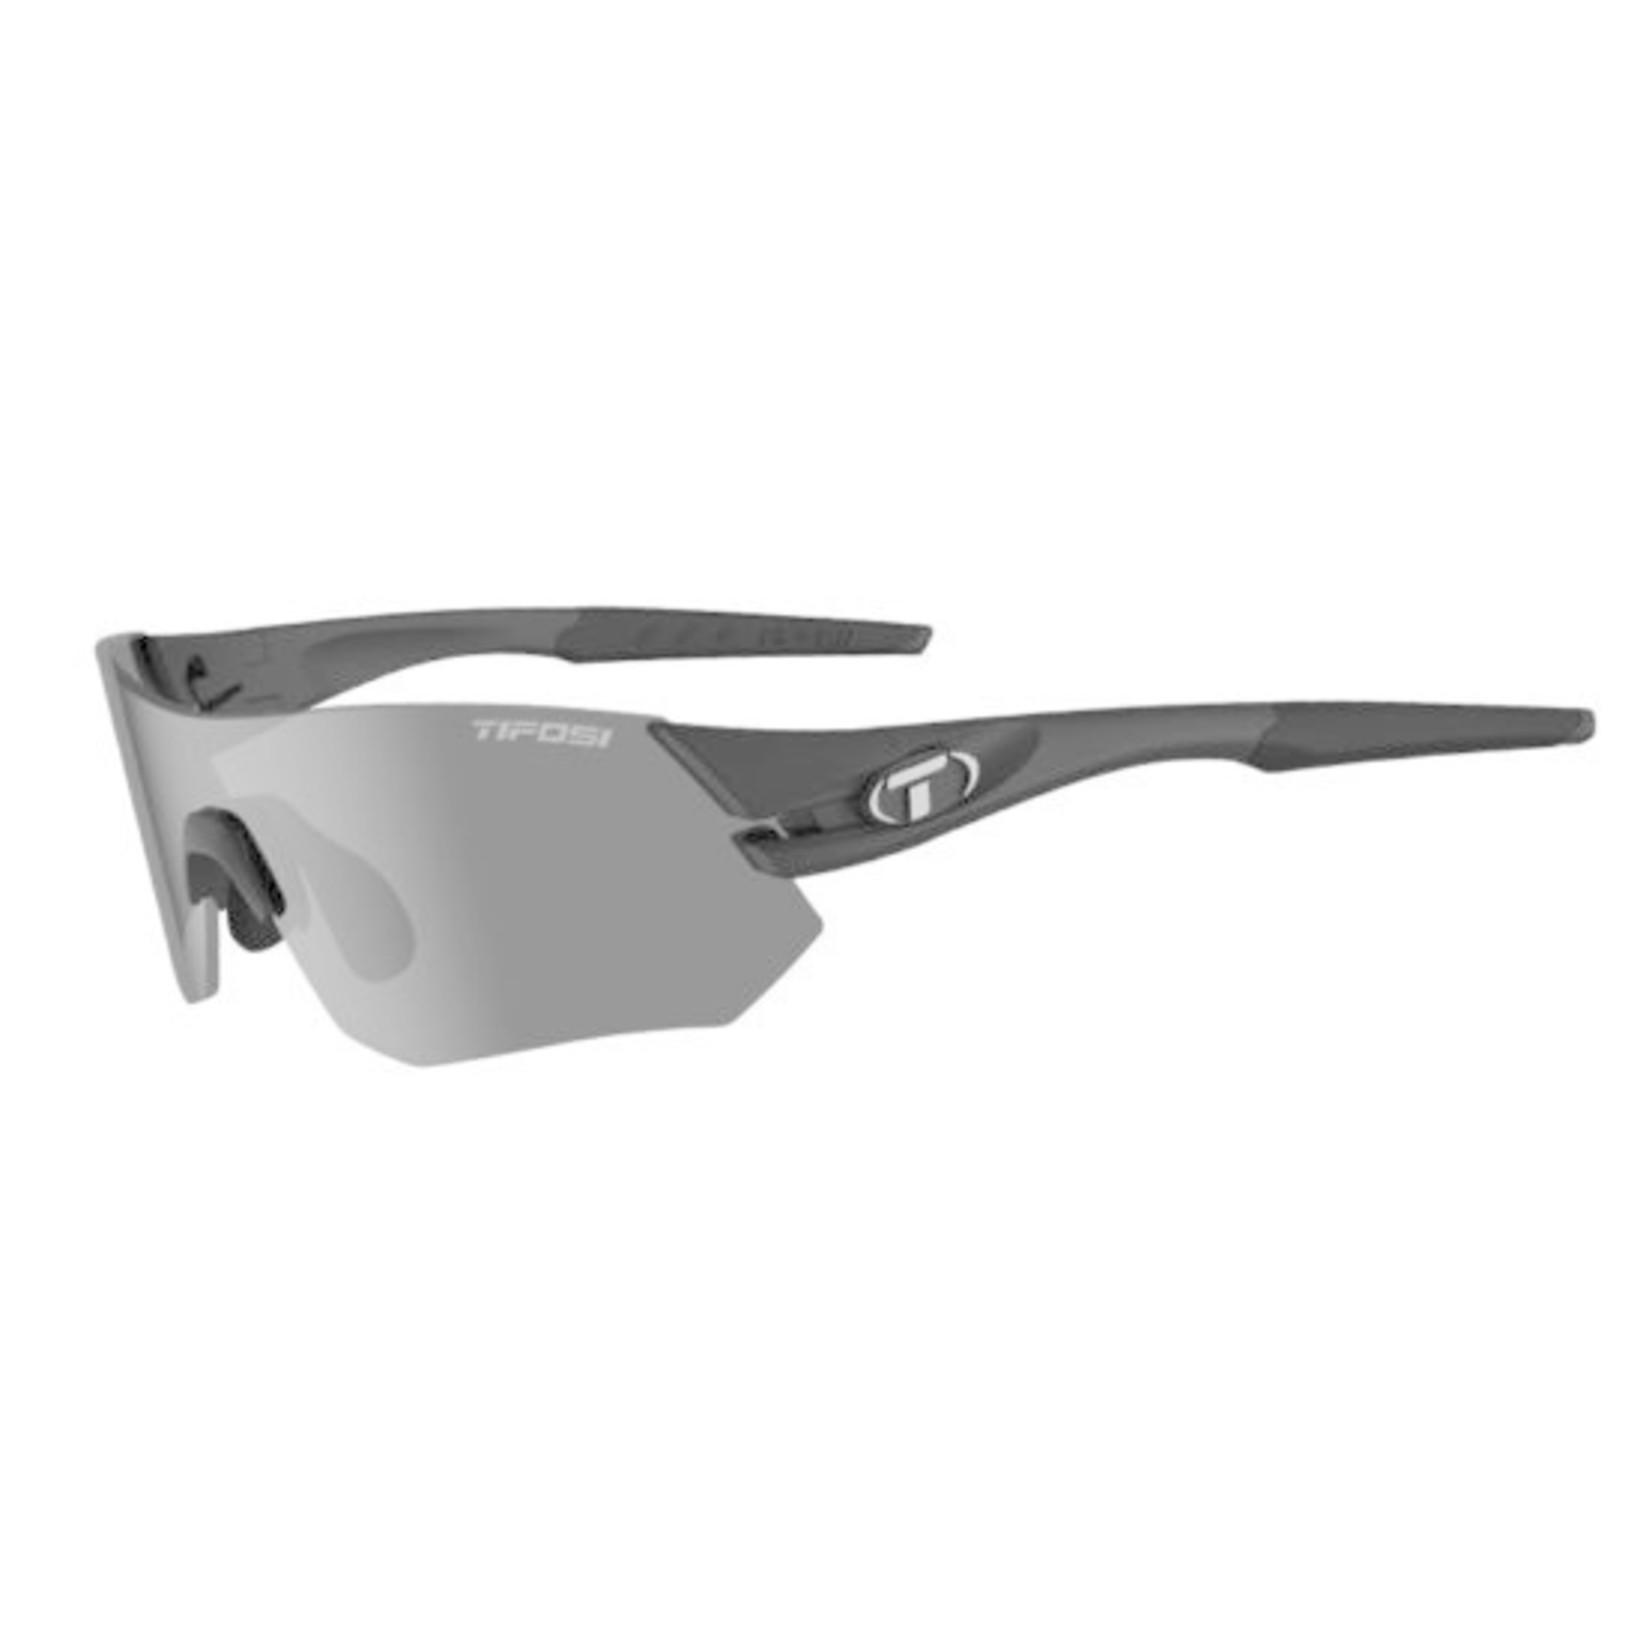 Tifosi Optics Tsali, Matte Black Interchangeable Sunglasses